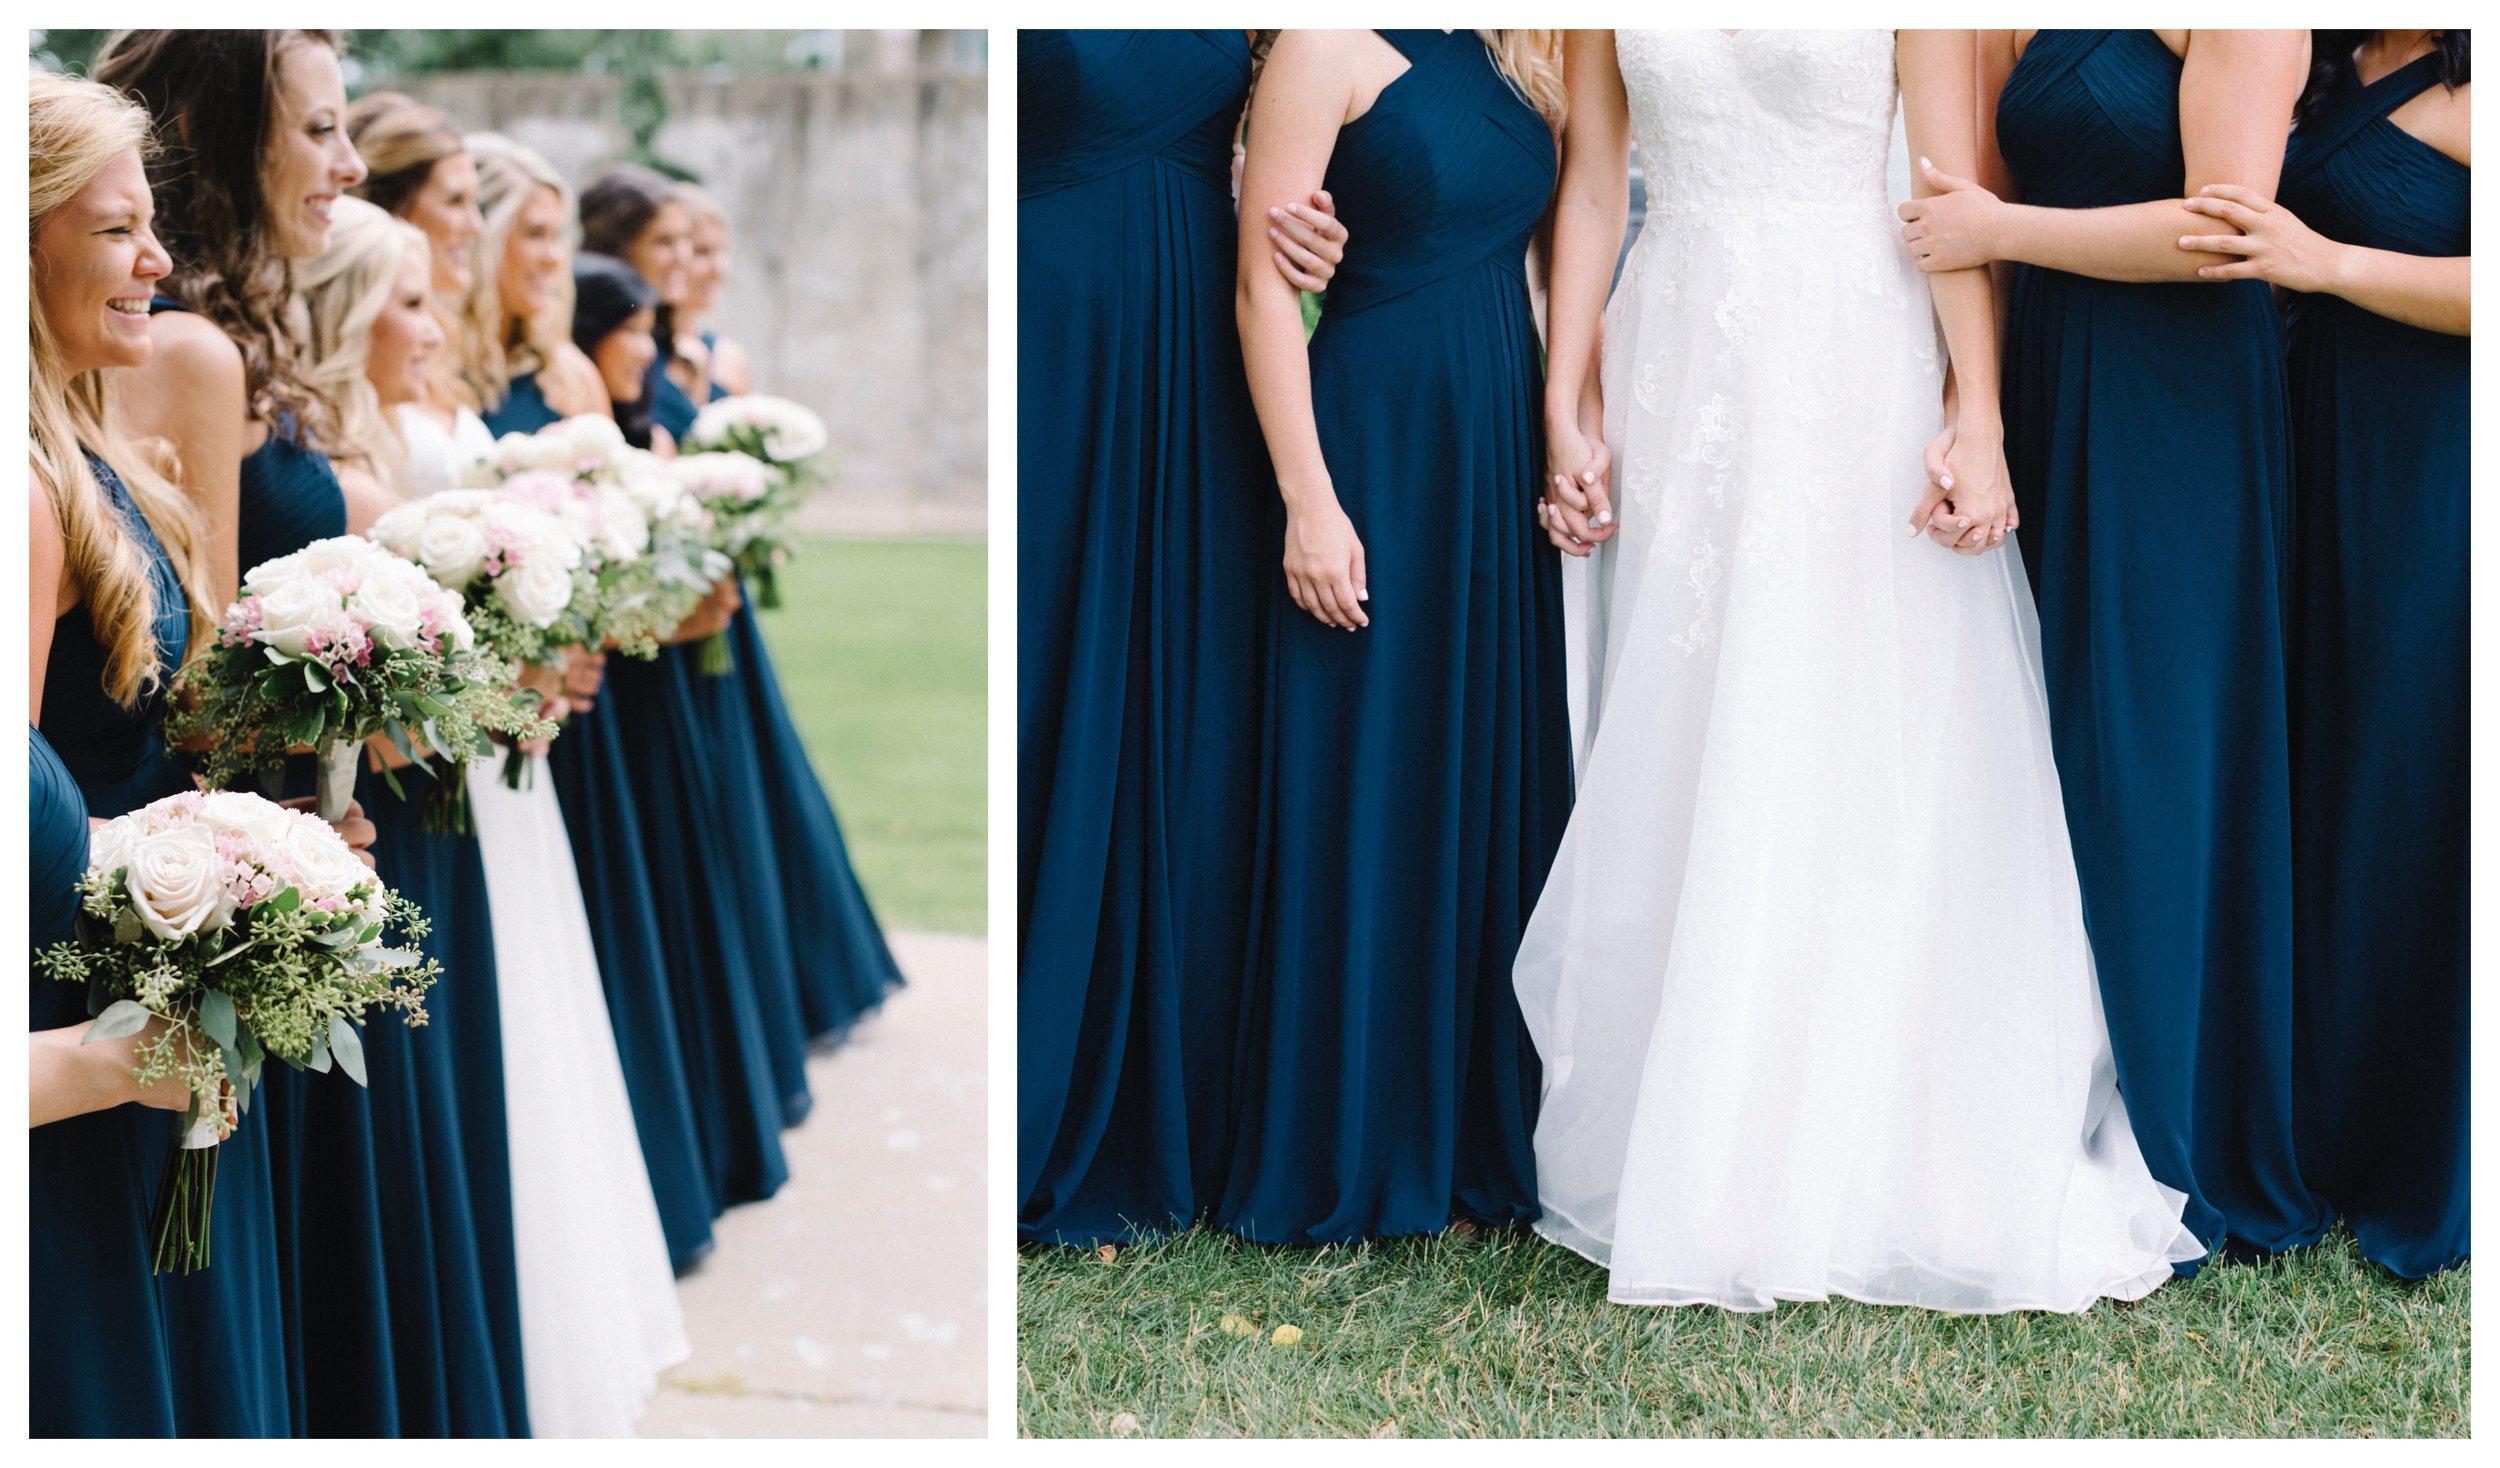 KansasCity_WeddingDress20